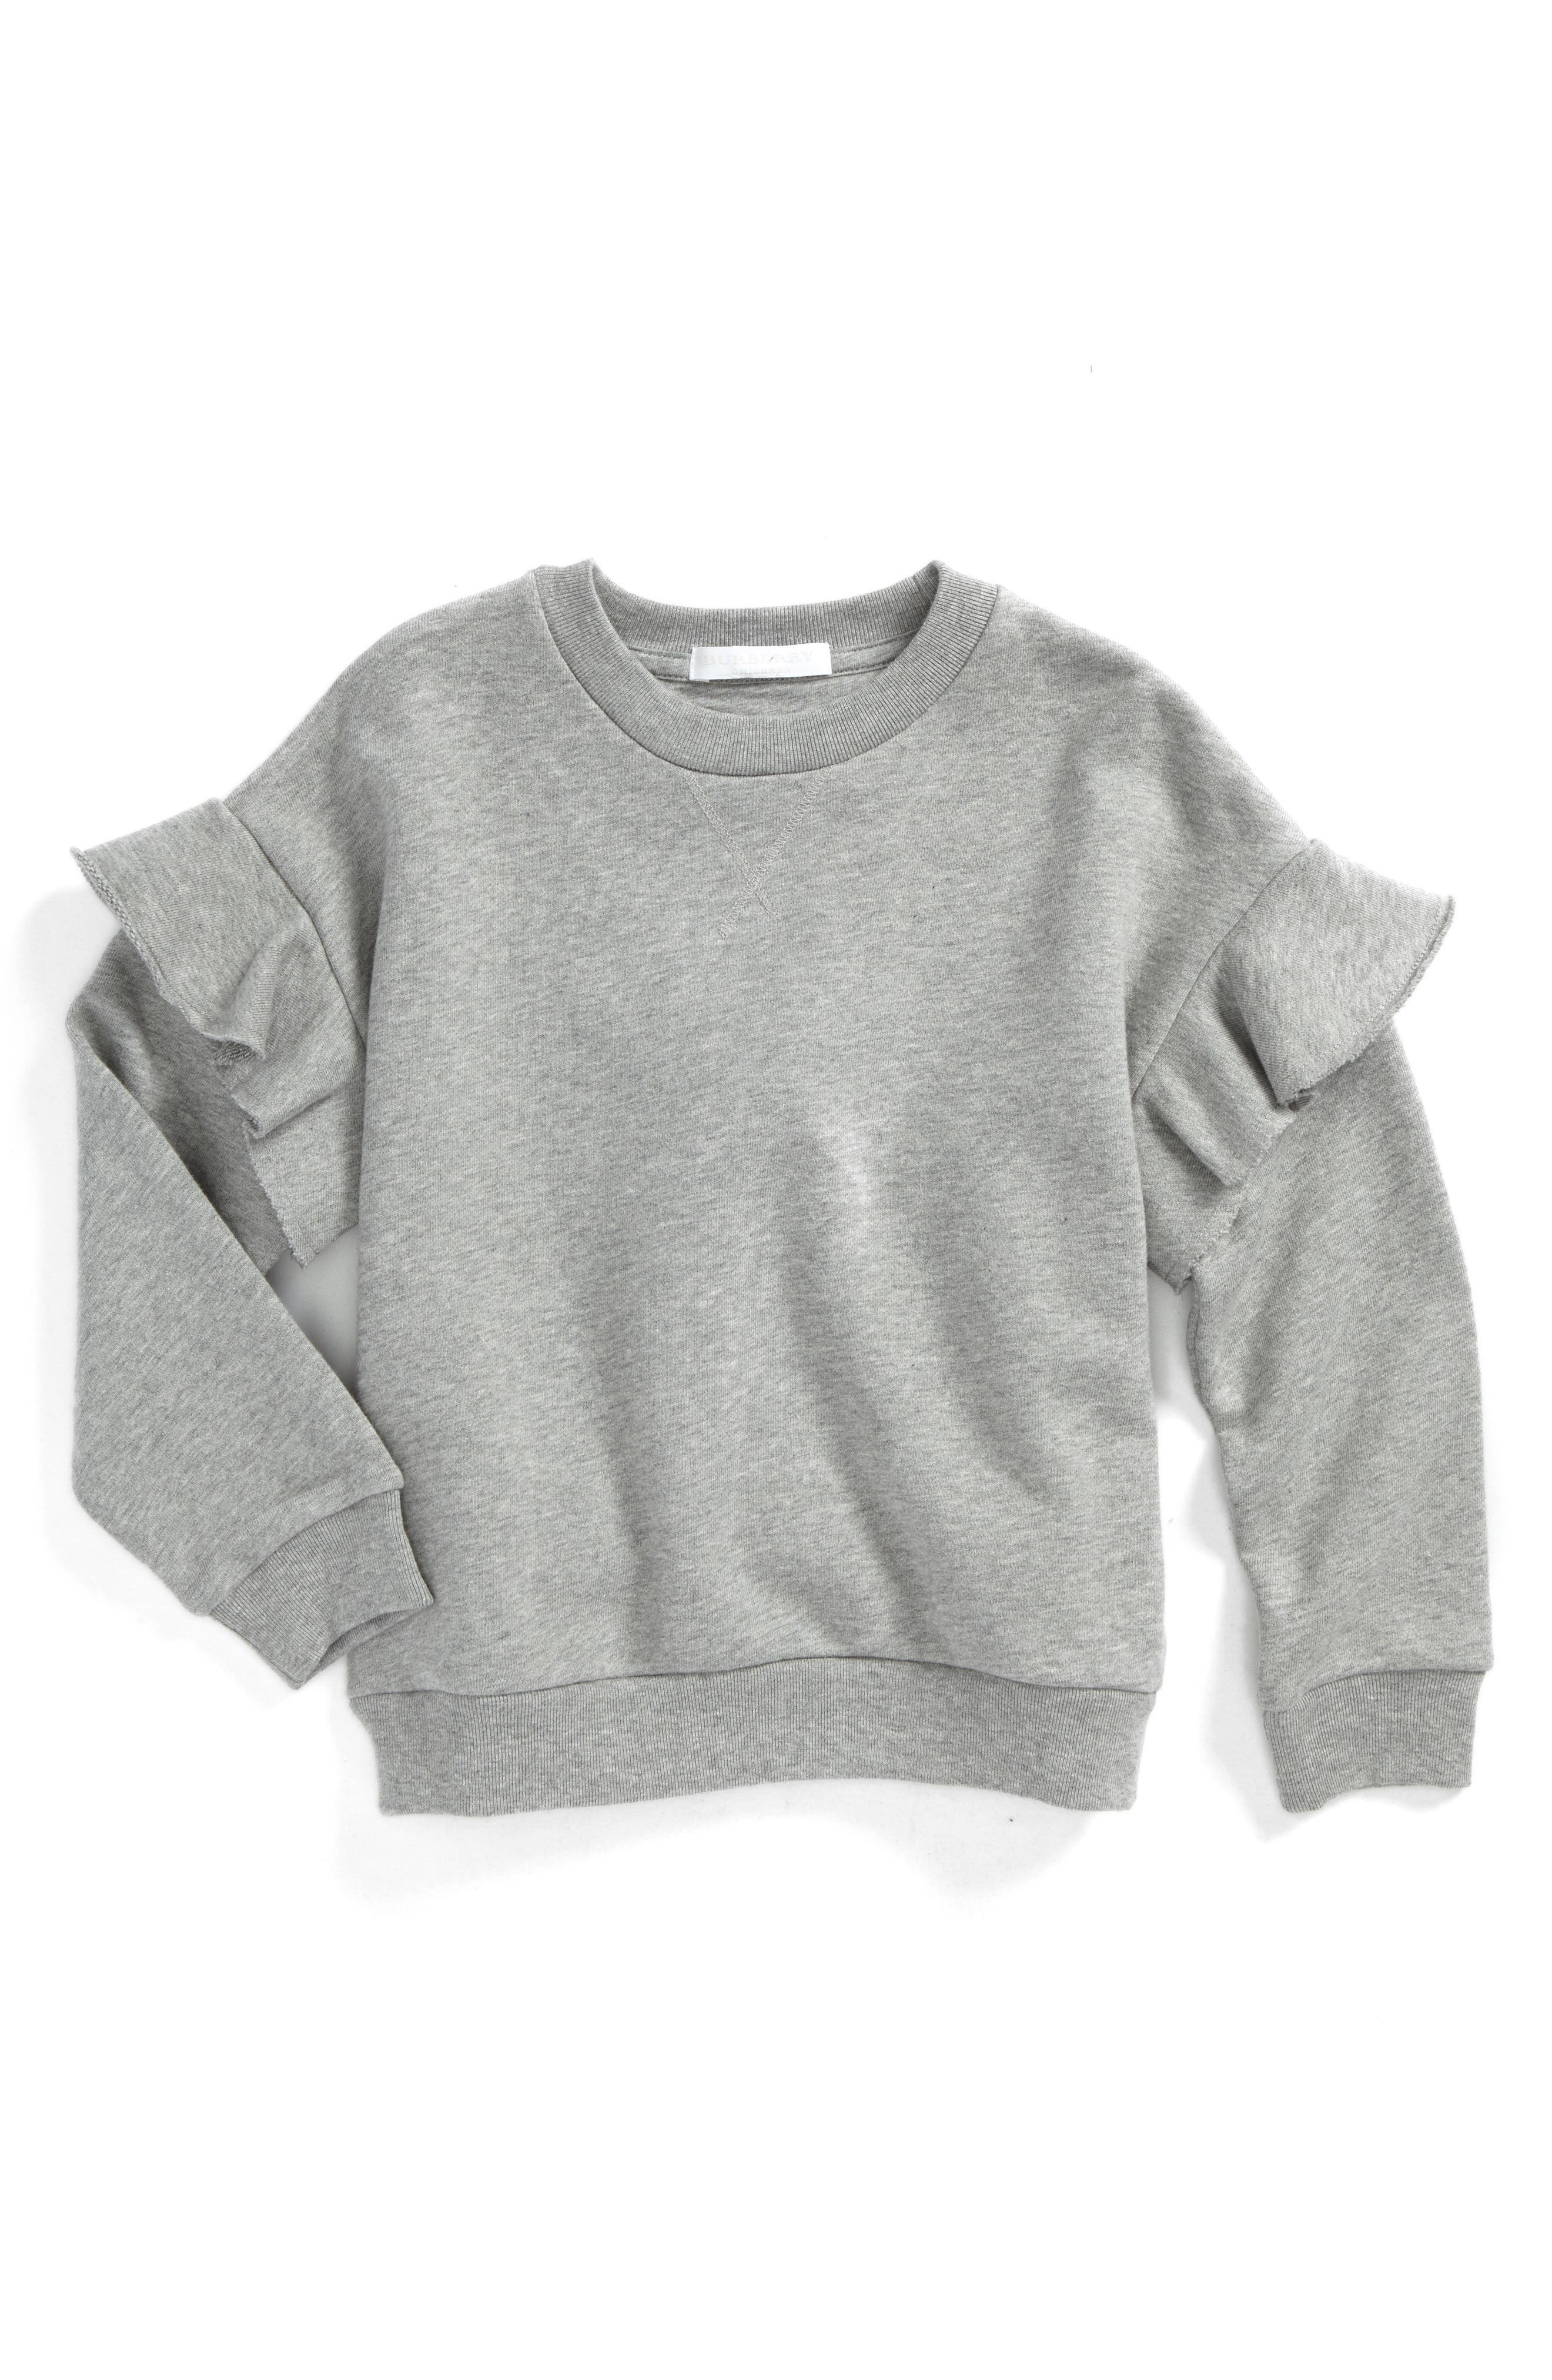 Main Image - Burberry Mini Neiman Ruffle Sweatshirt (Little Girls & Big Girls)